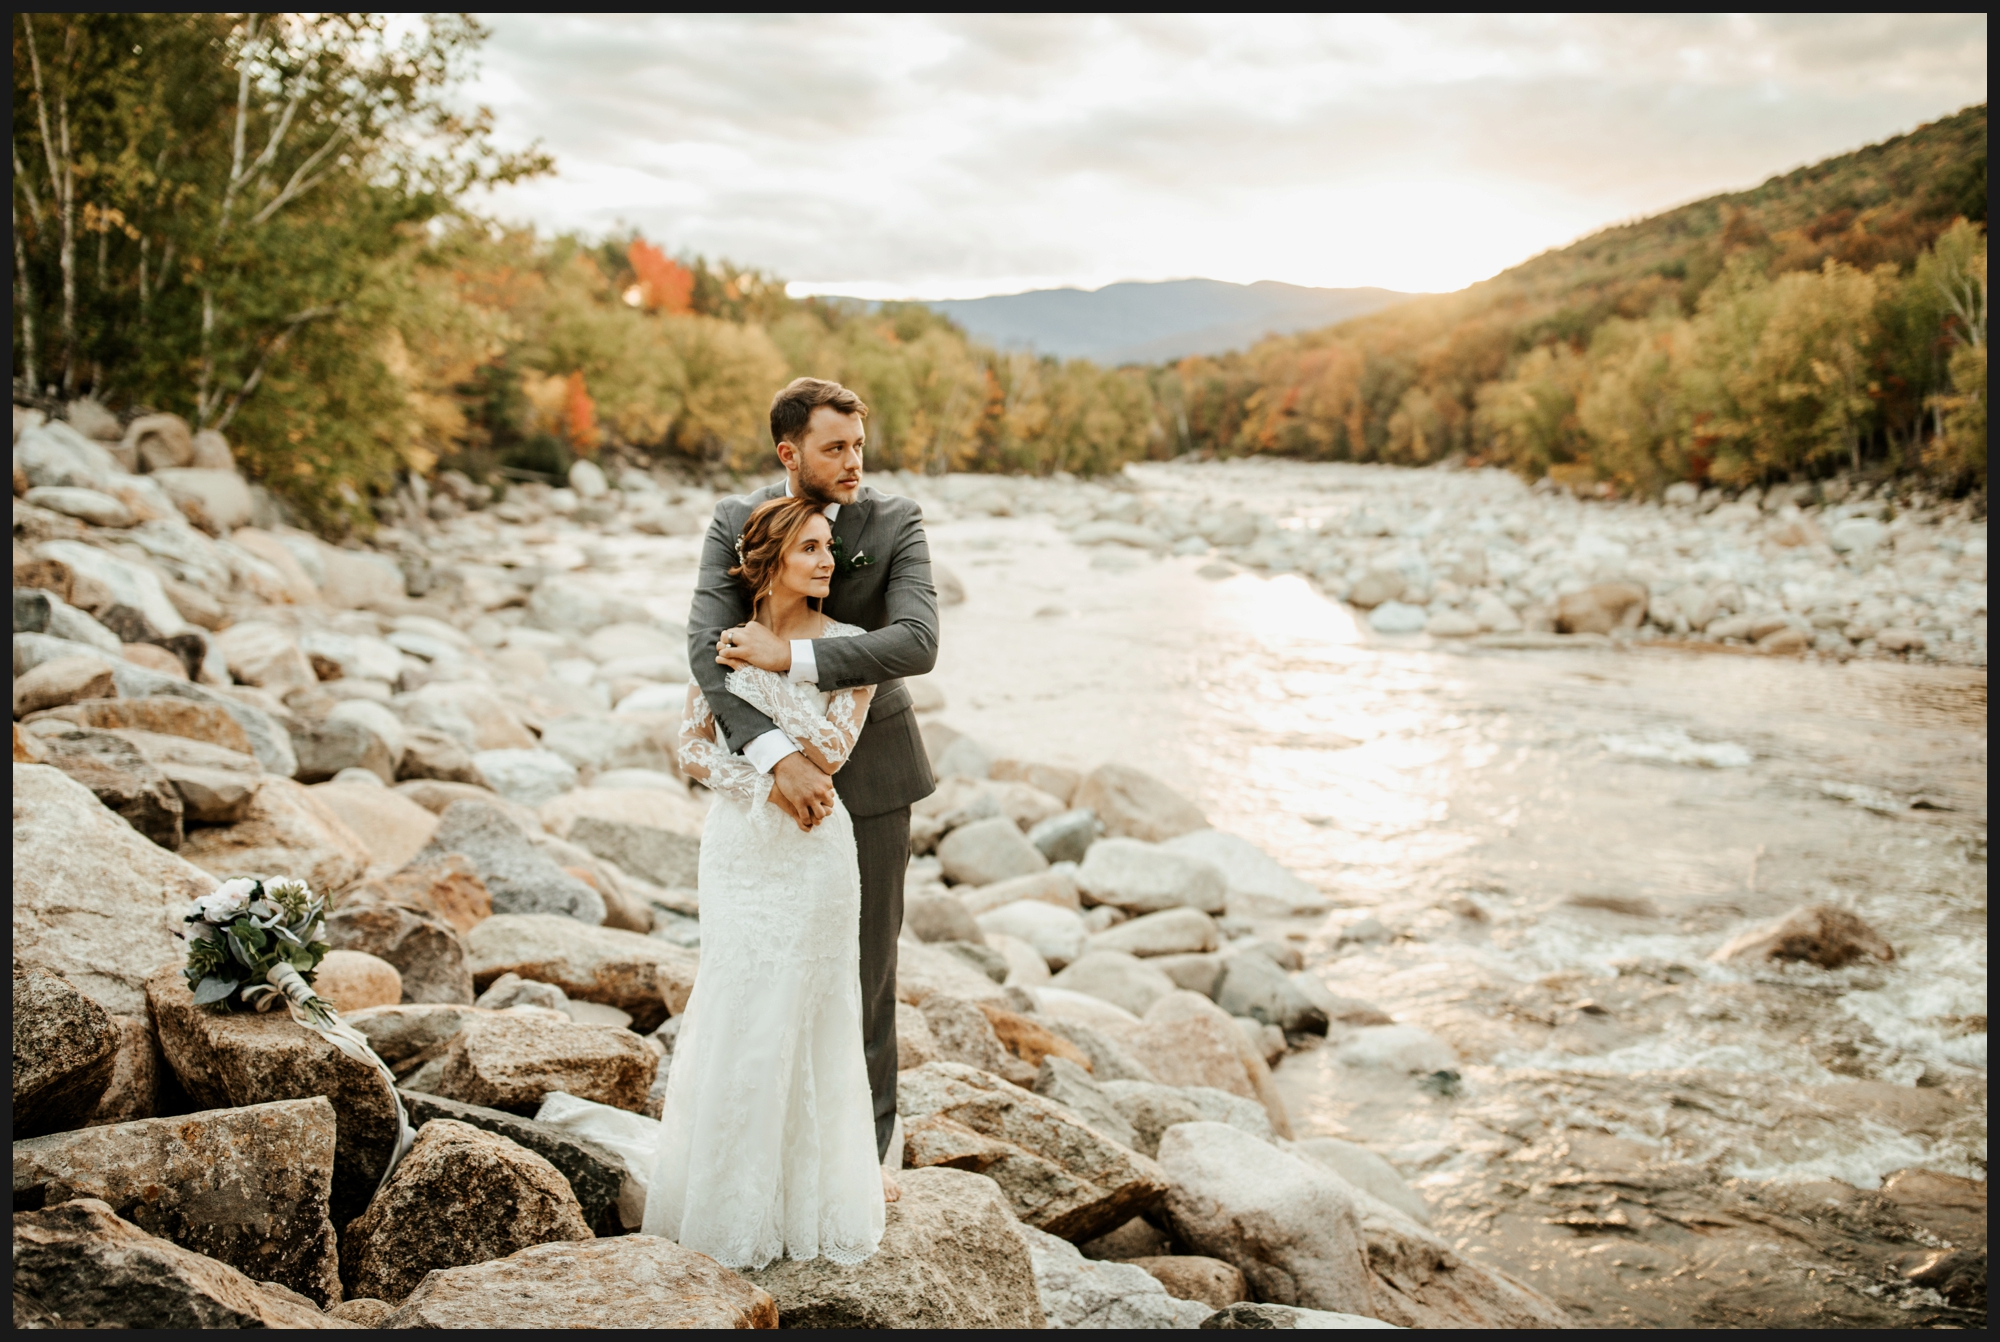 Orlando-Wedding-Photographer-destination-wedding-photographer-florida-wedding-photographer-hawaii-wedding-photographer_0117.jpg